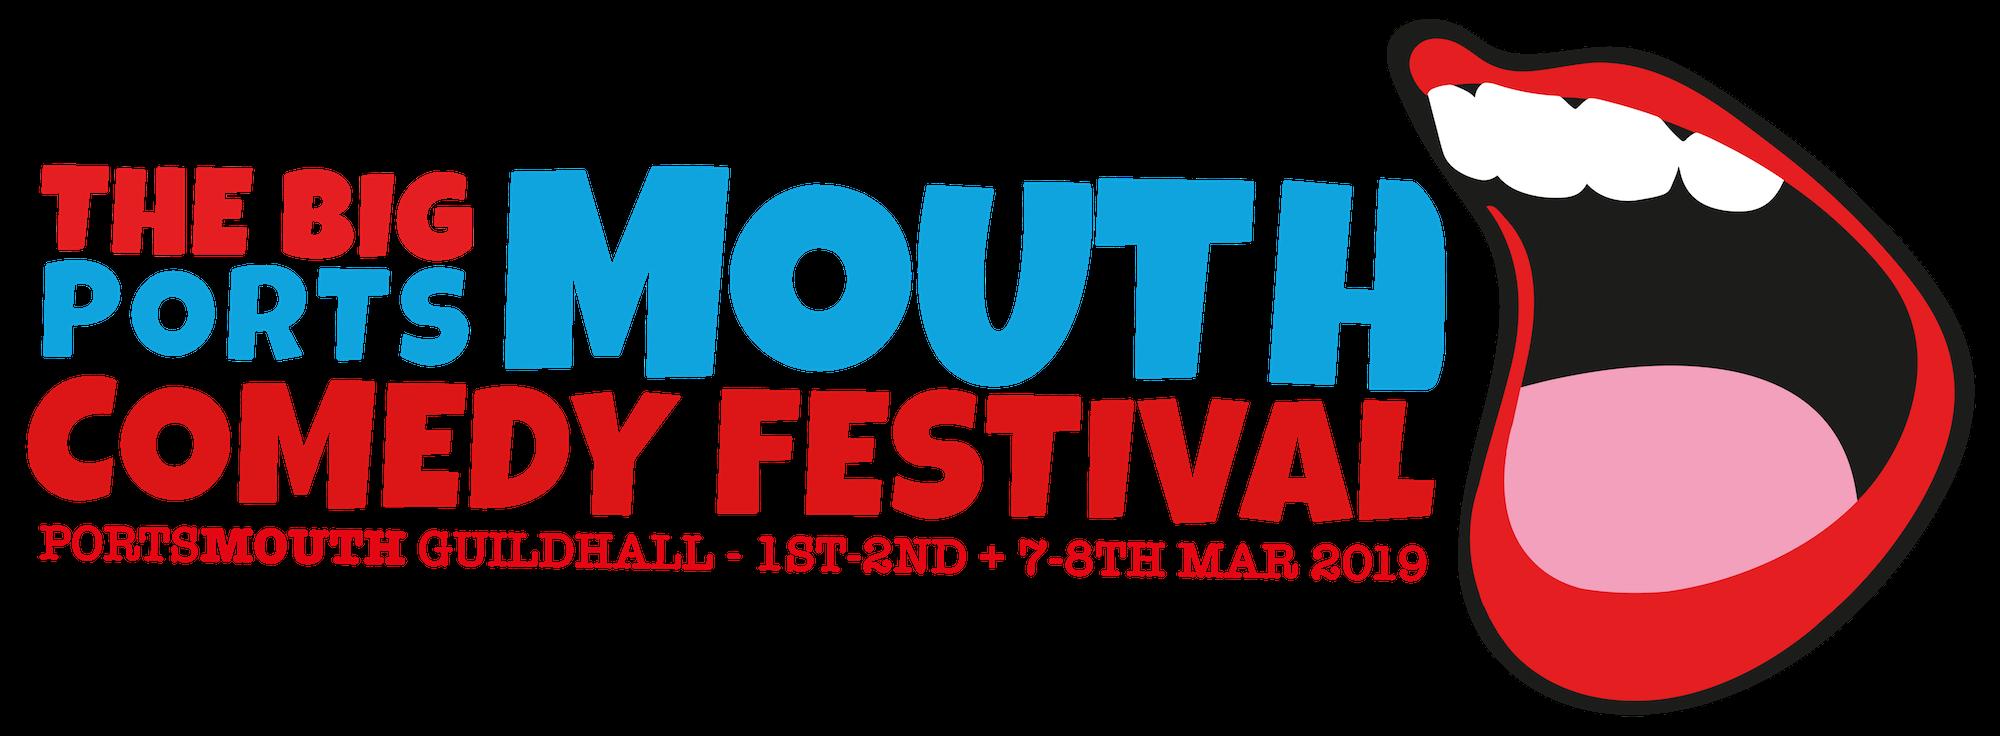 (c) Bigmouthcomedyfestival.co.uk